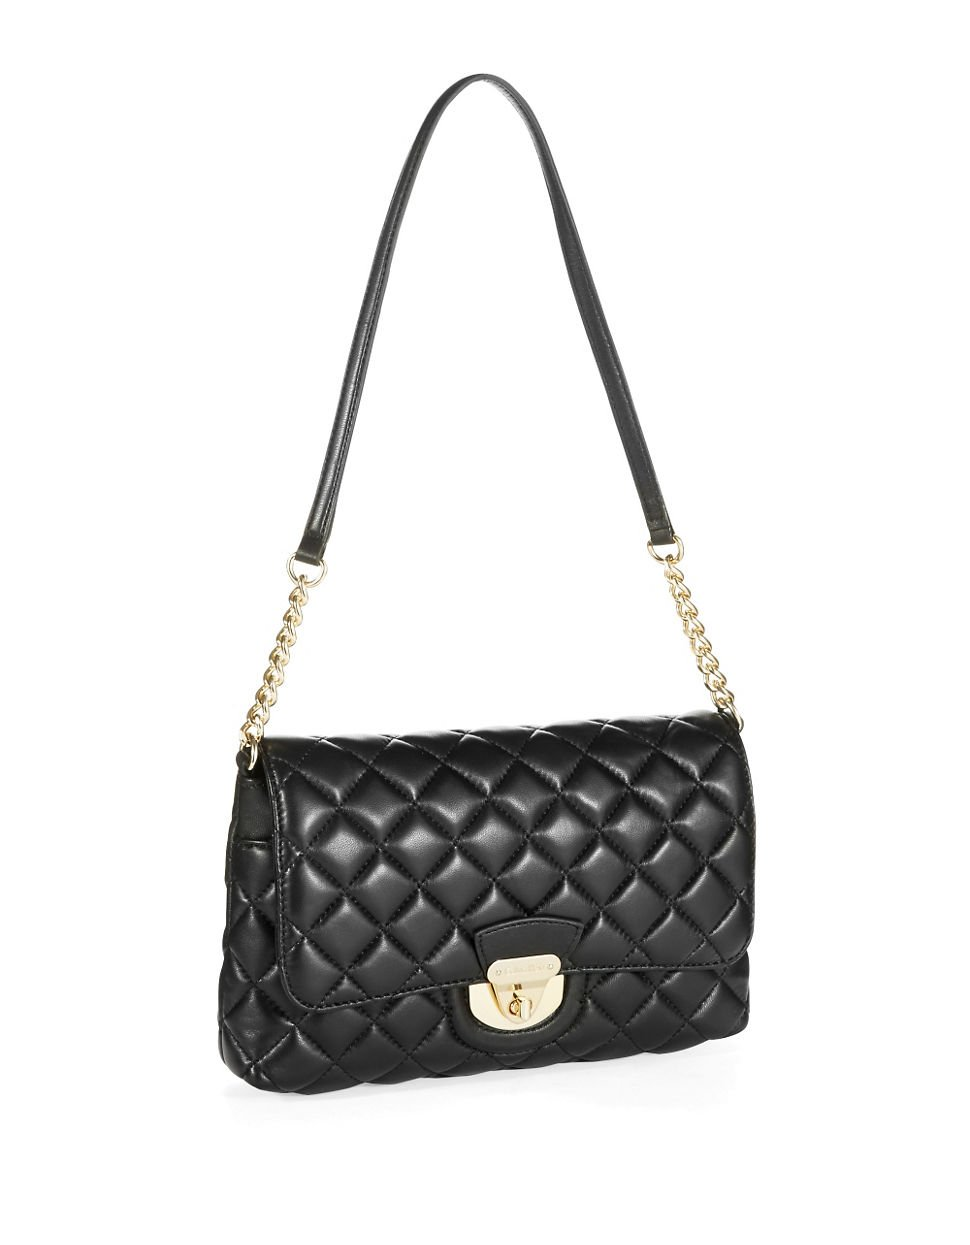 Calvin Klein Quilted Crossbody Bag In Black Black Gold